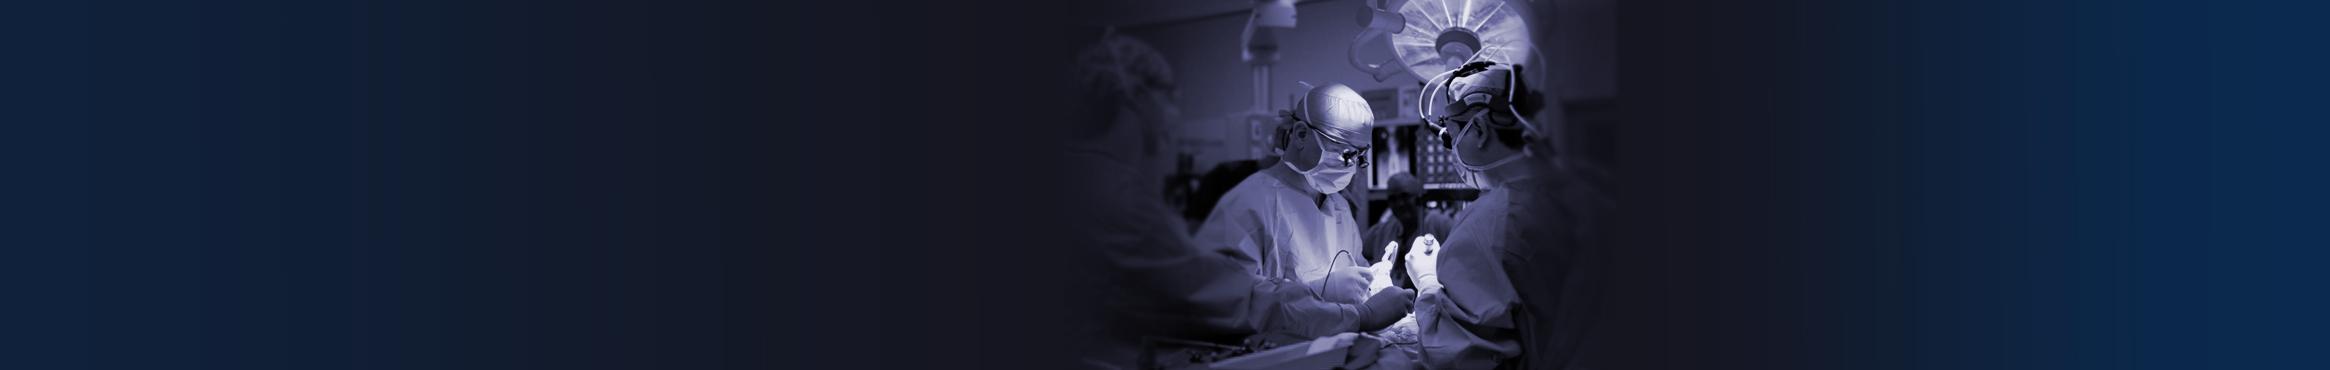 Surgeons-Blue-Slider